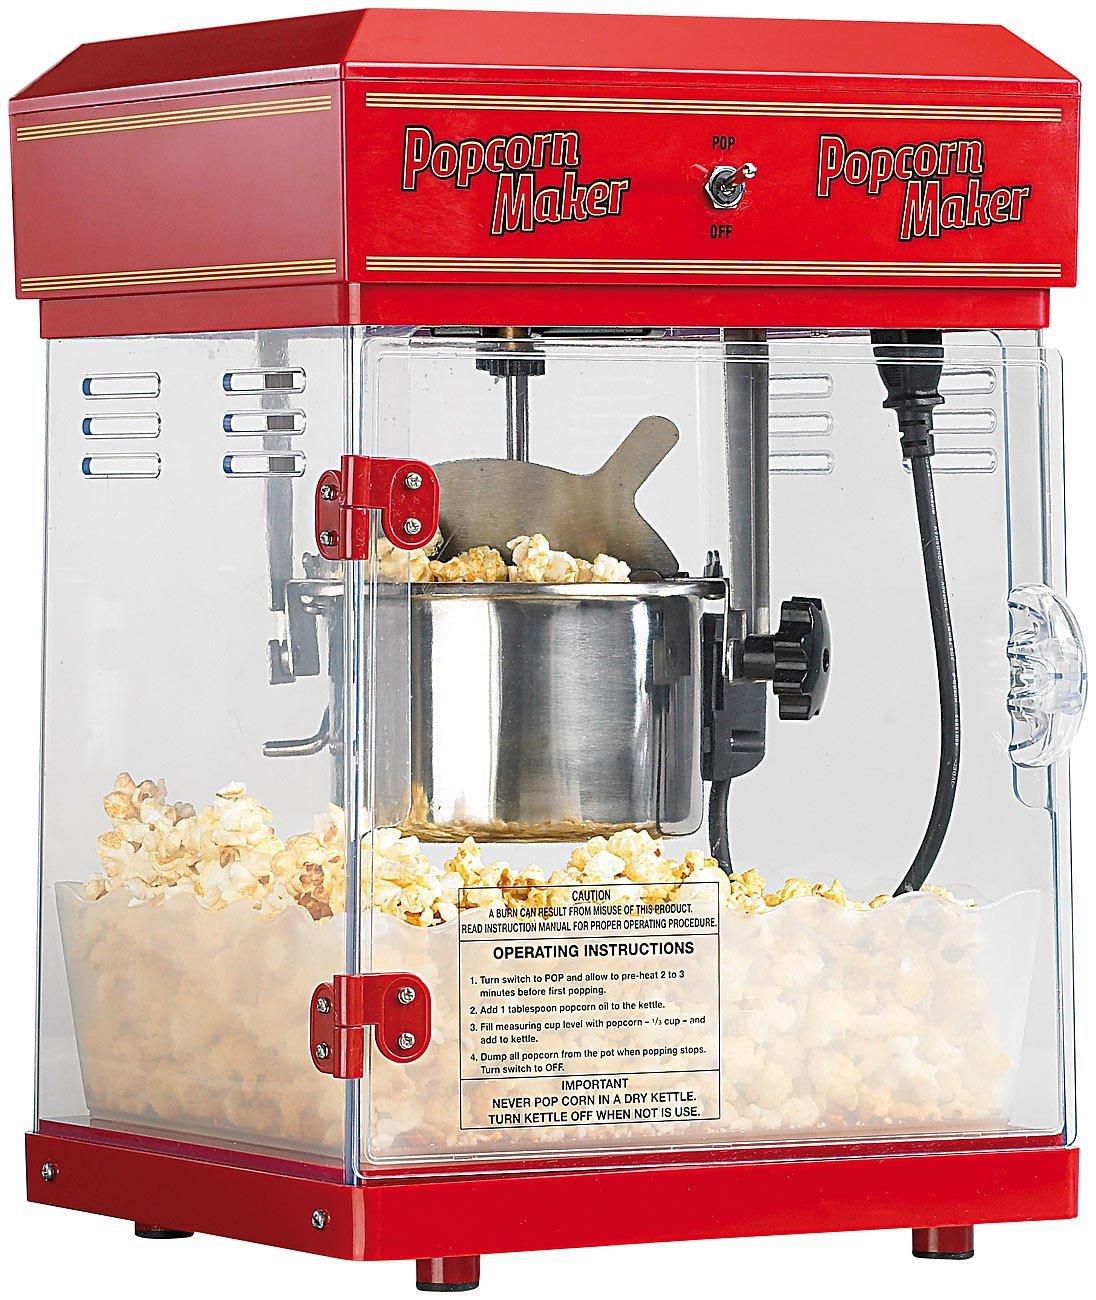 popcornmaschine popcorn wie im kino. Black Bedroom Furniture Sets. Home Design Ideas